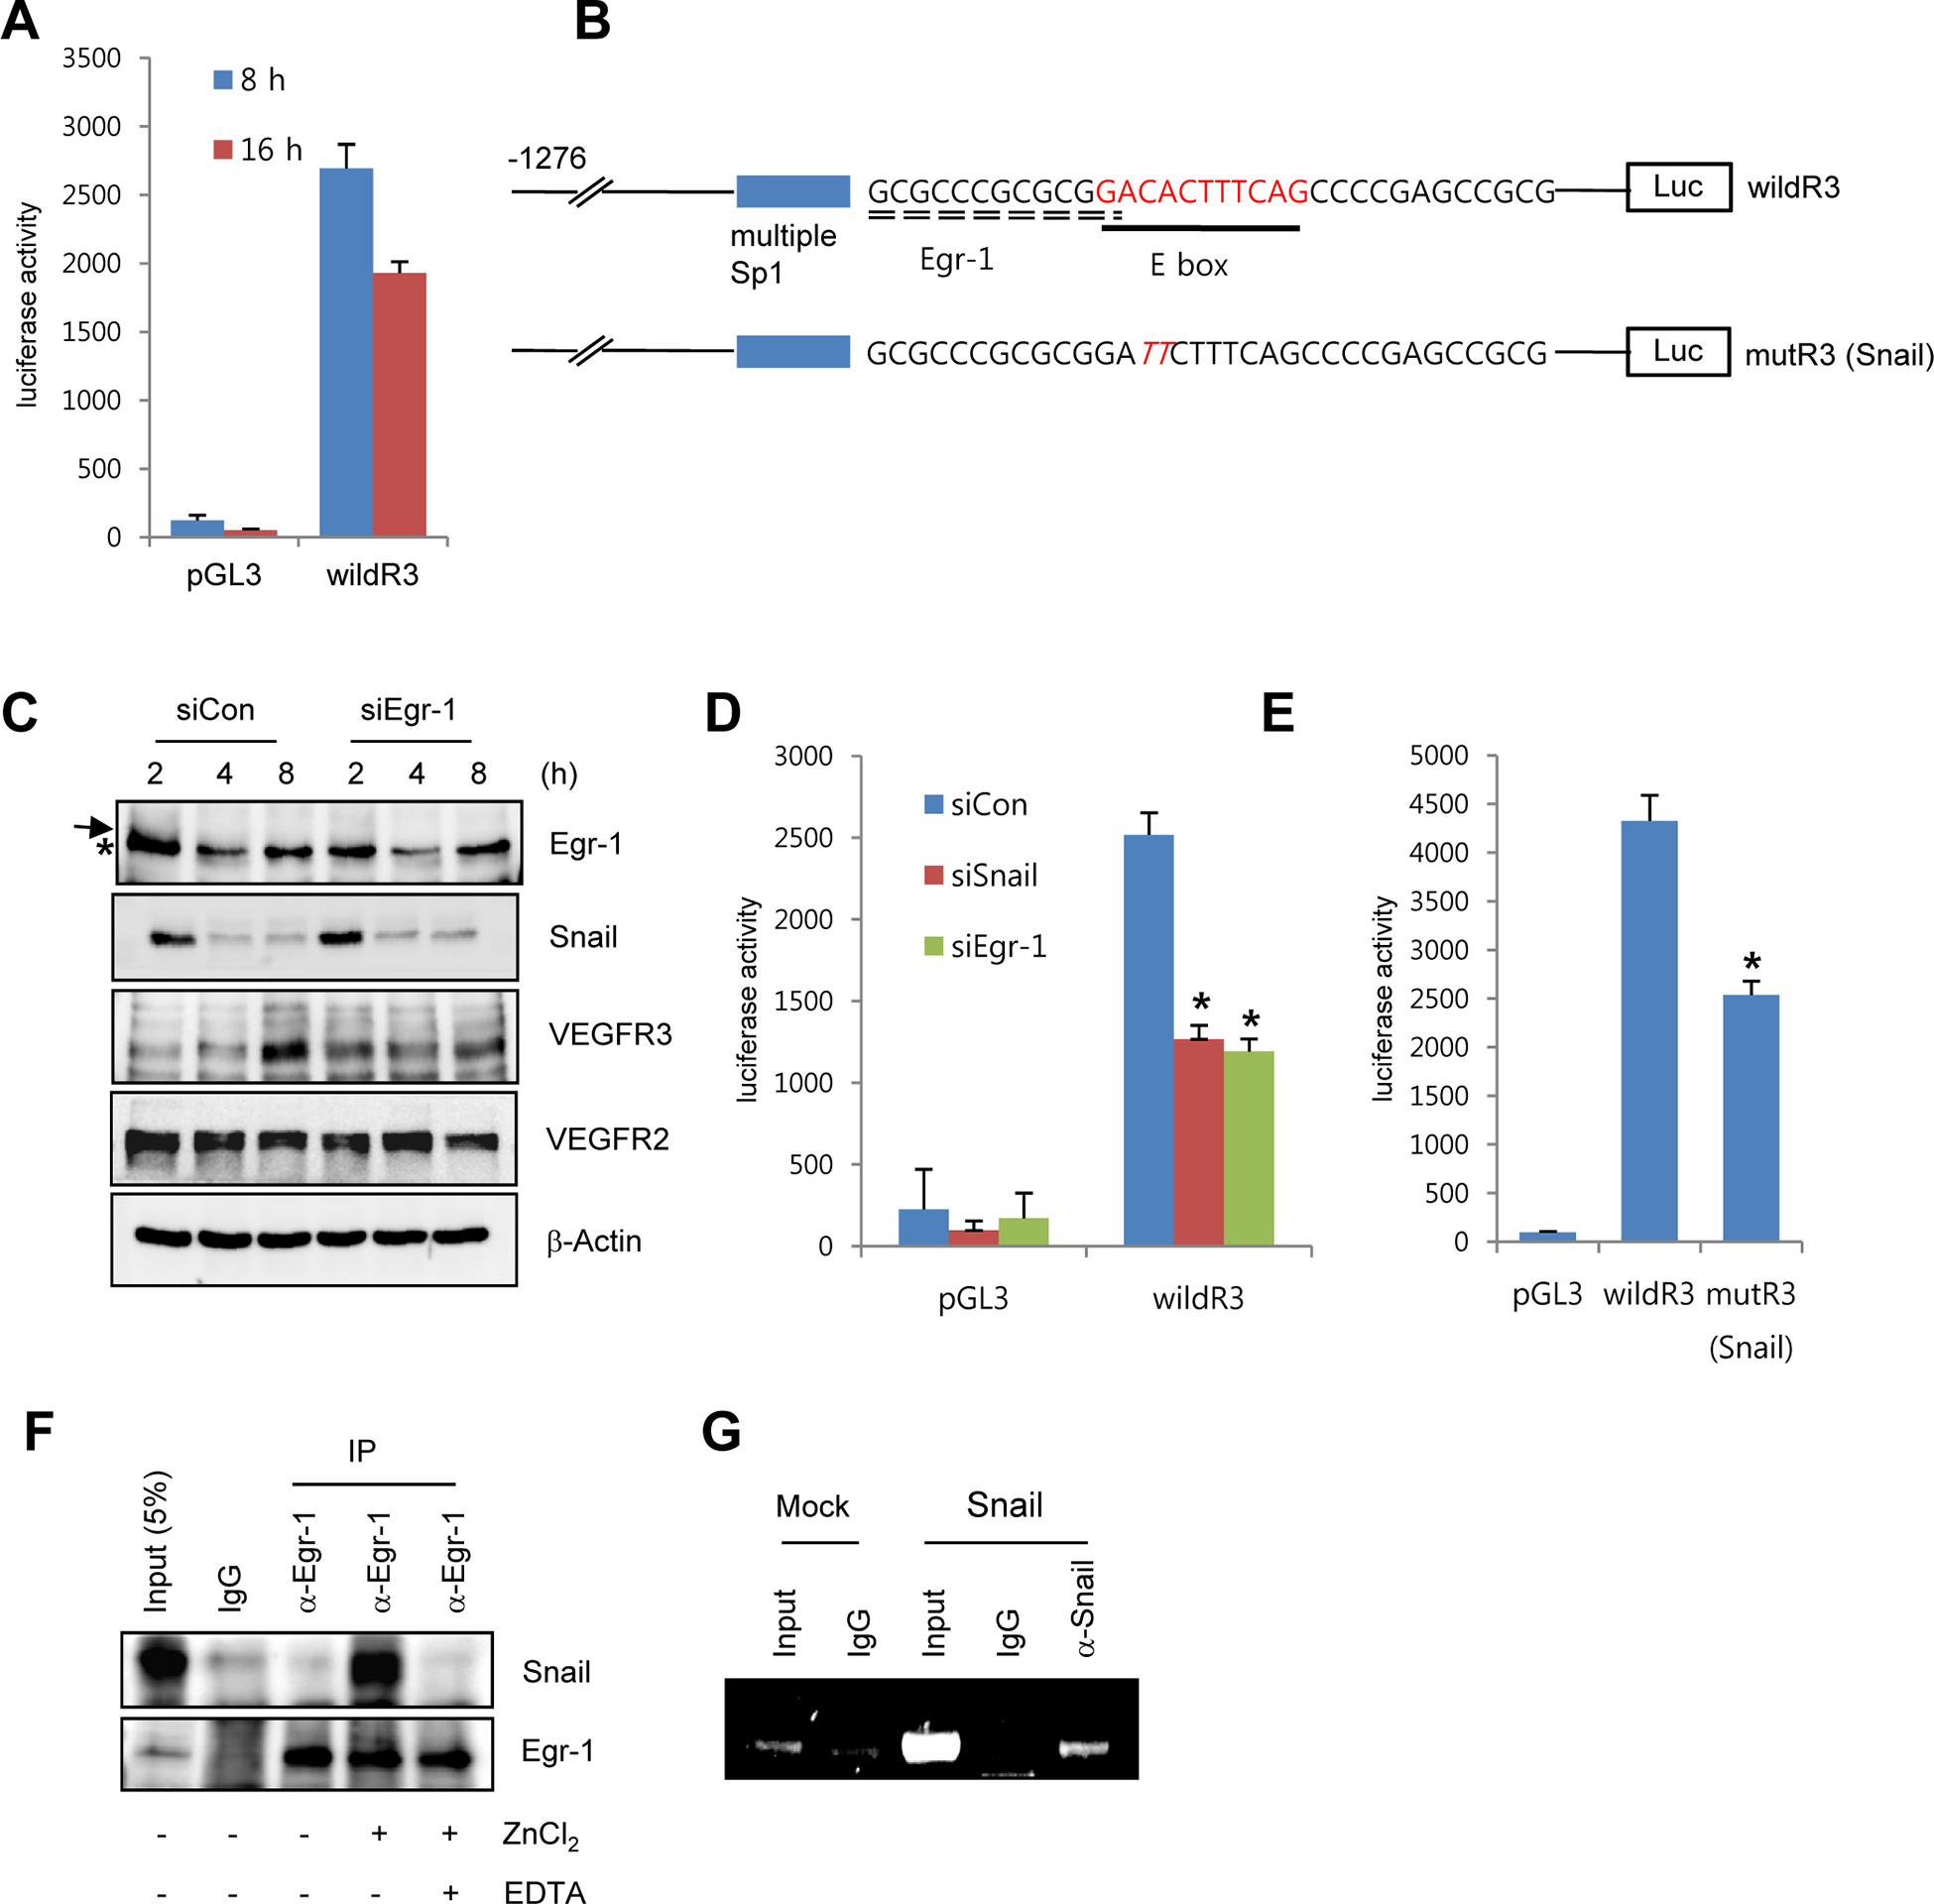 Snail upregulates VEGFR3 transcripts via cooperating with Egr-1.